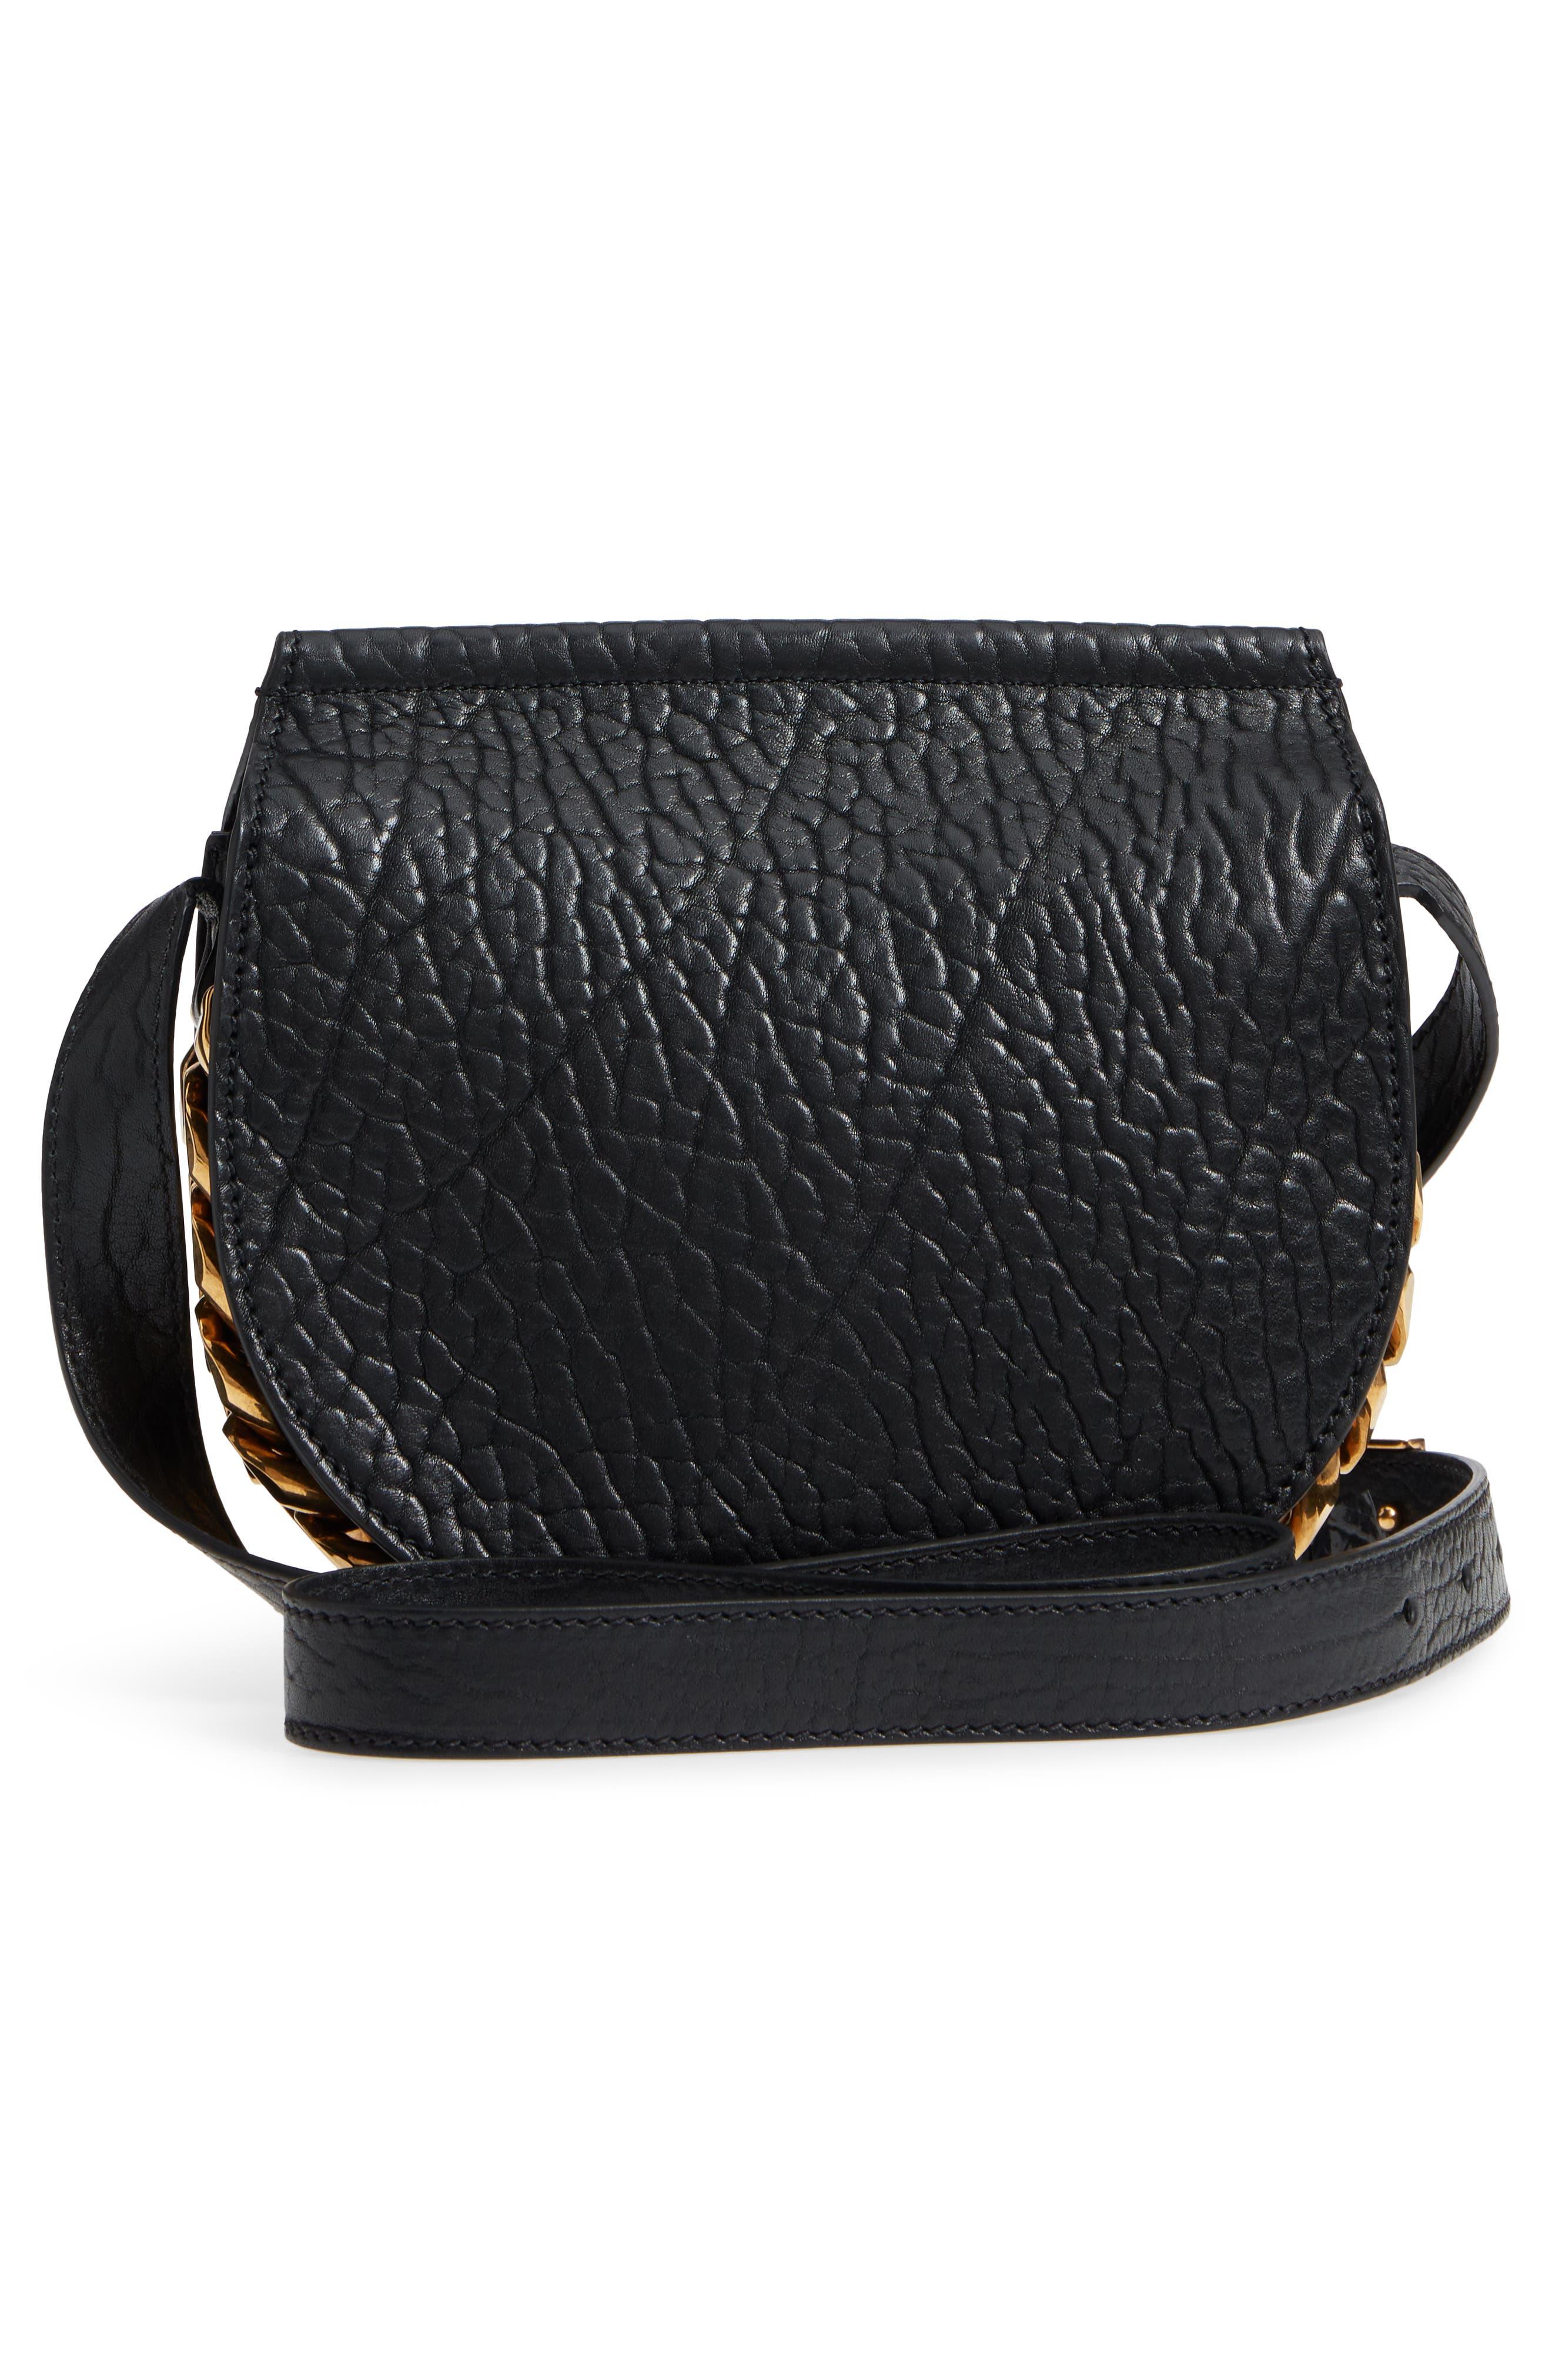 Infinity Calfskin Leather Saddle Bag,                             Alternate thumbnail 3, color,                             Black